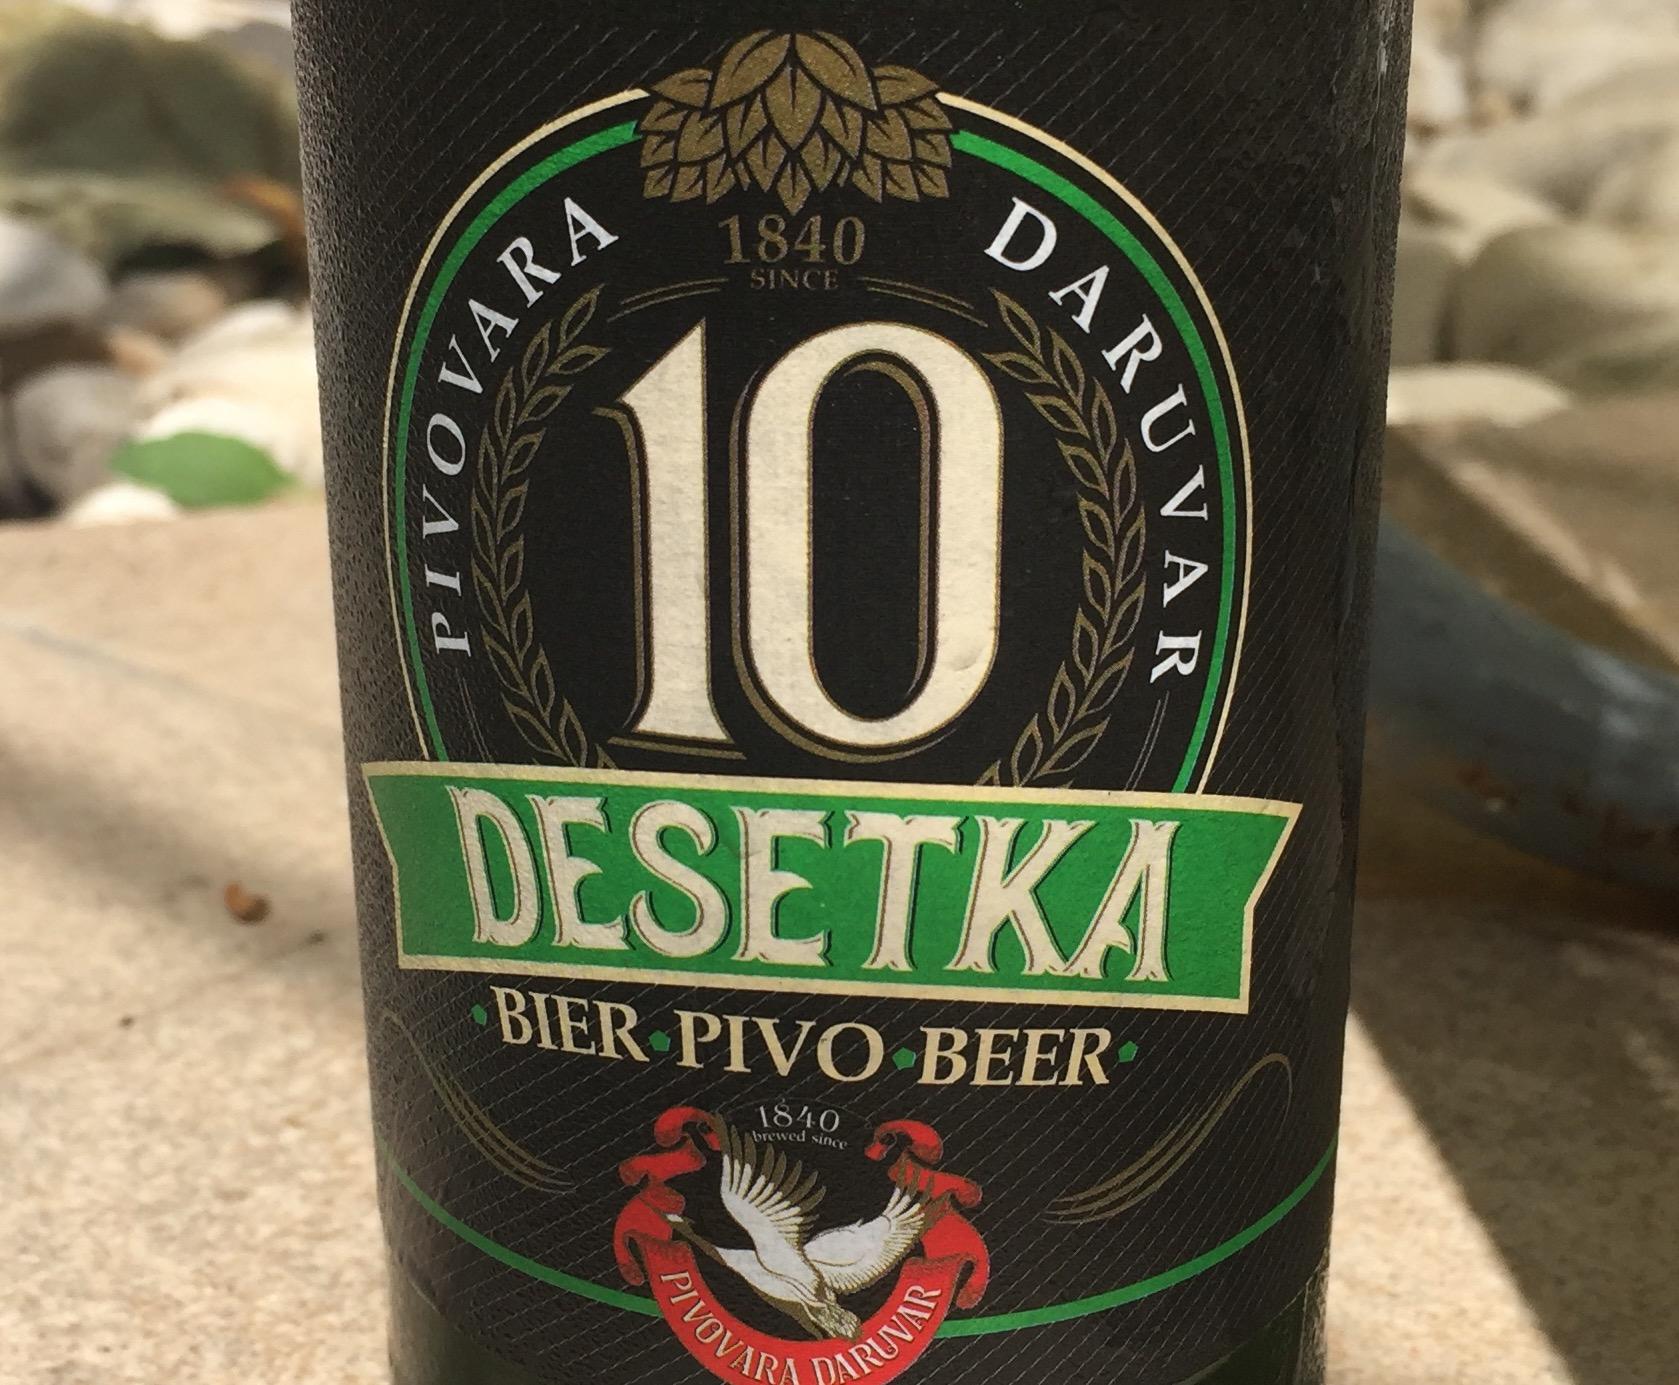 10 Desetka